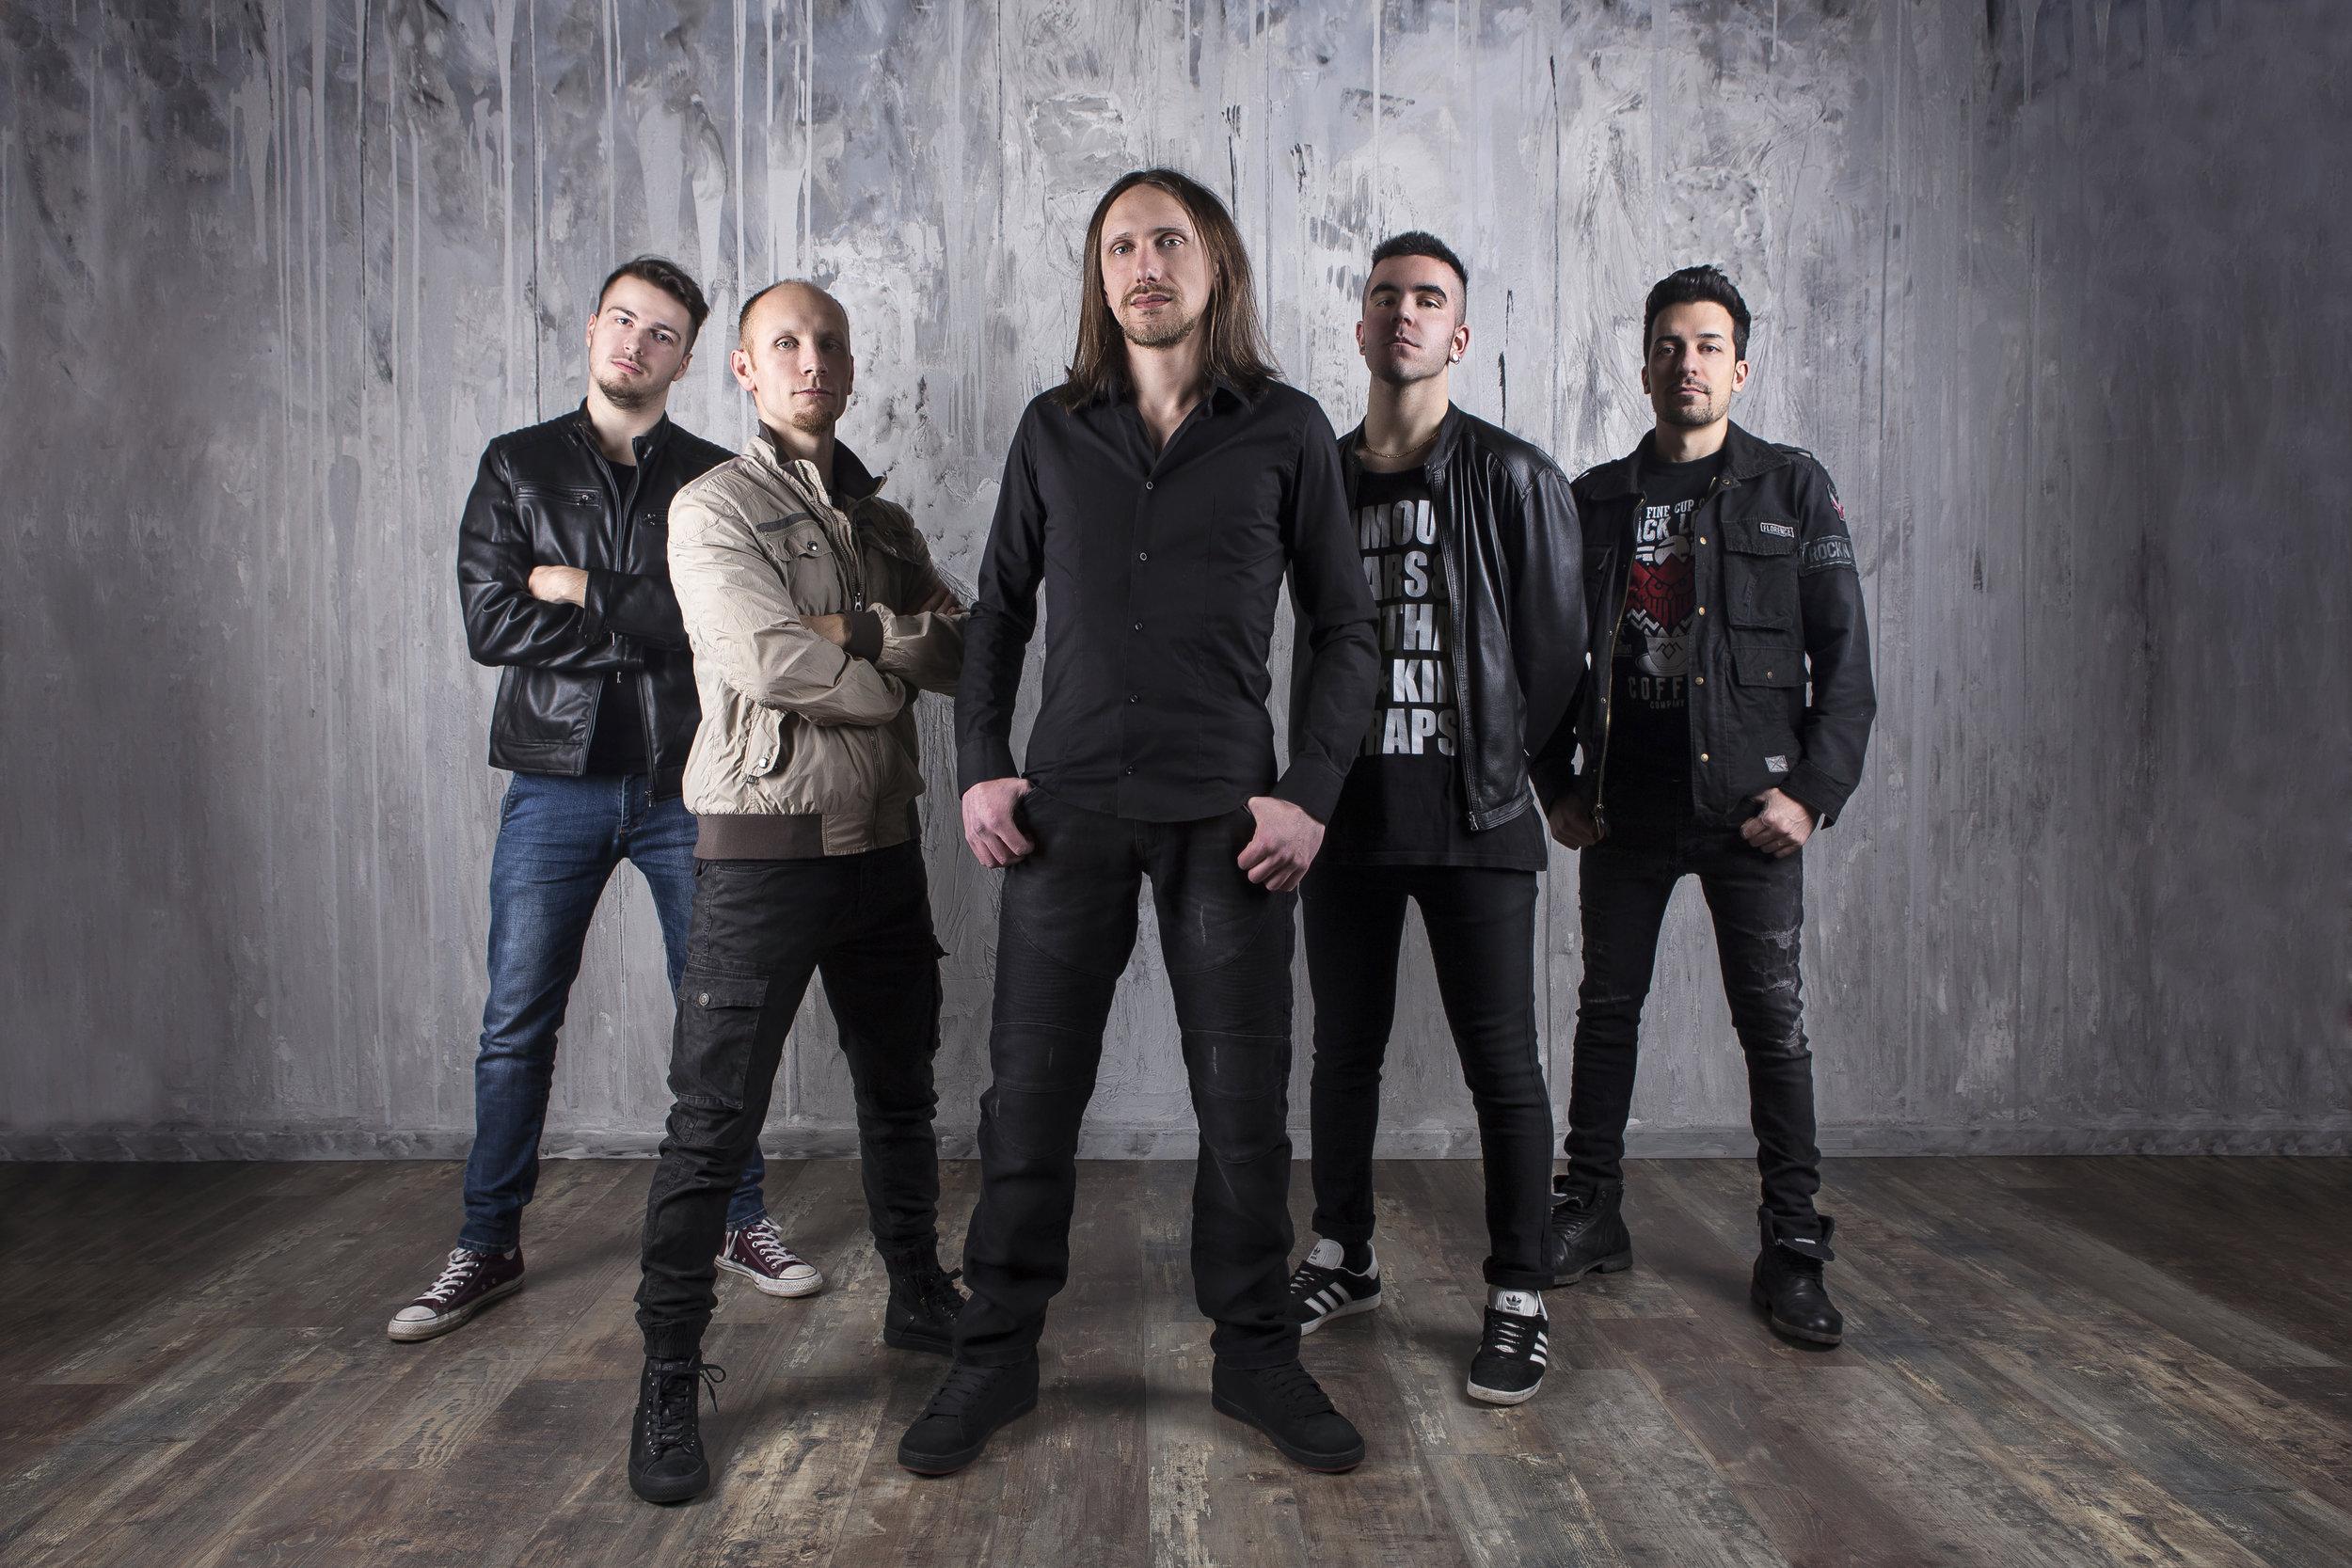 foto band metal milano fotografo musica